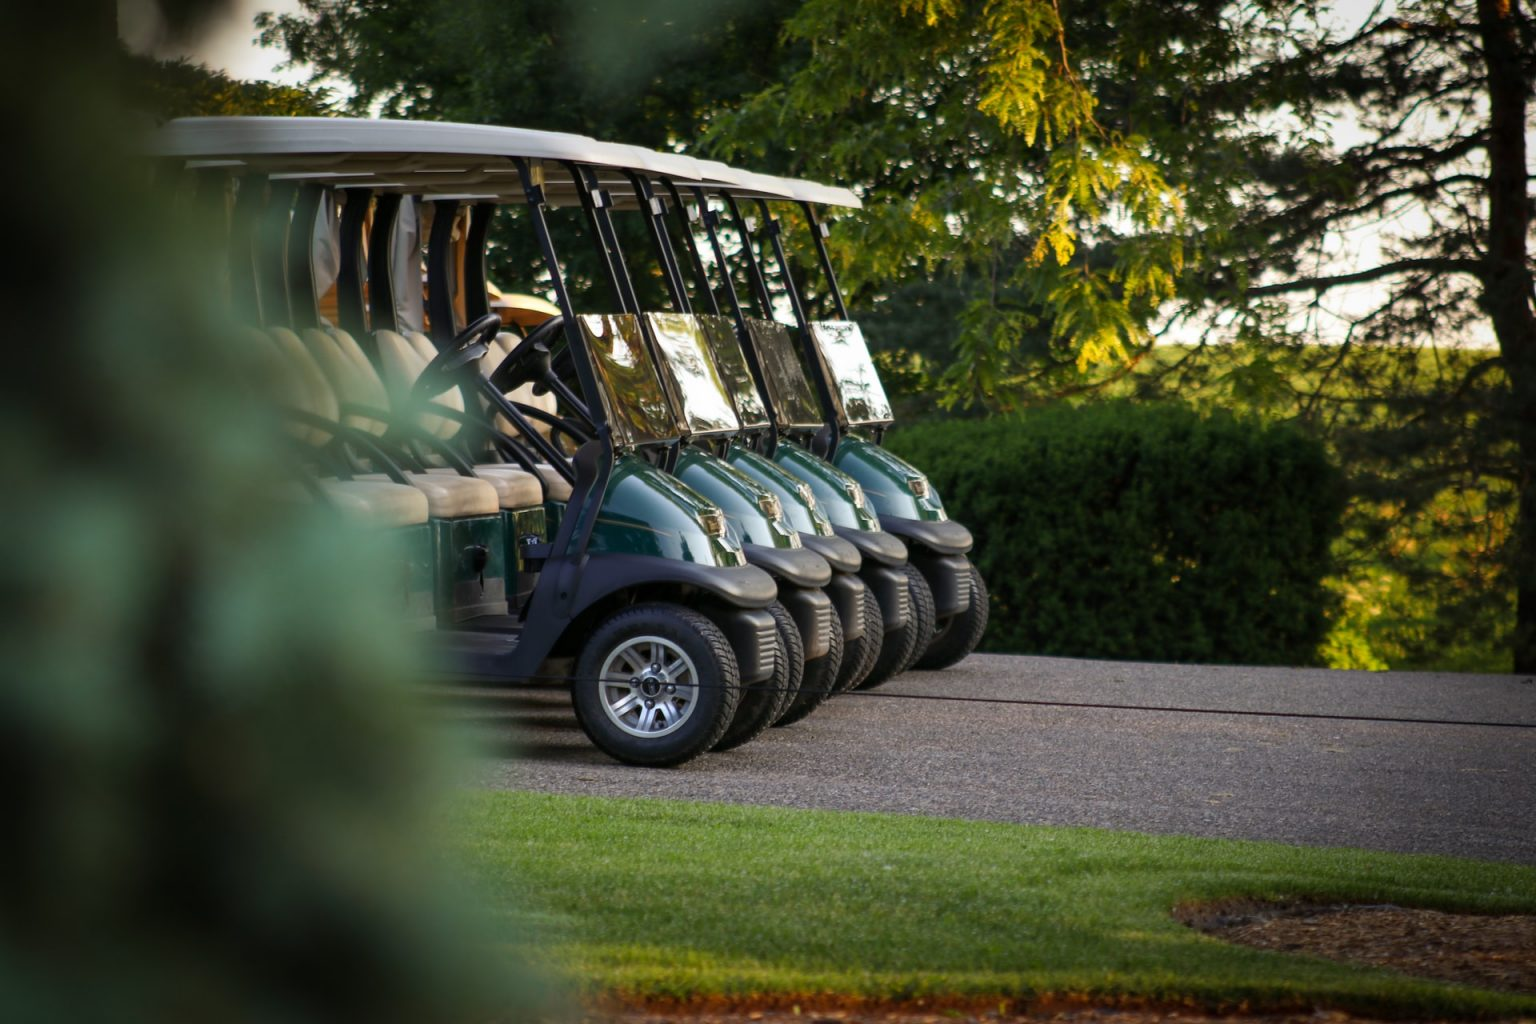 alondra golf course carts gardena lawndale